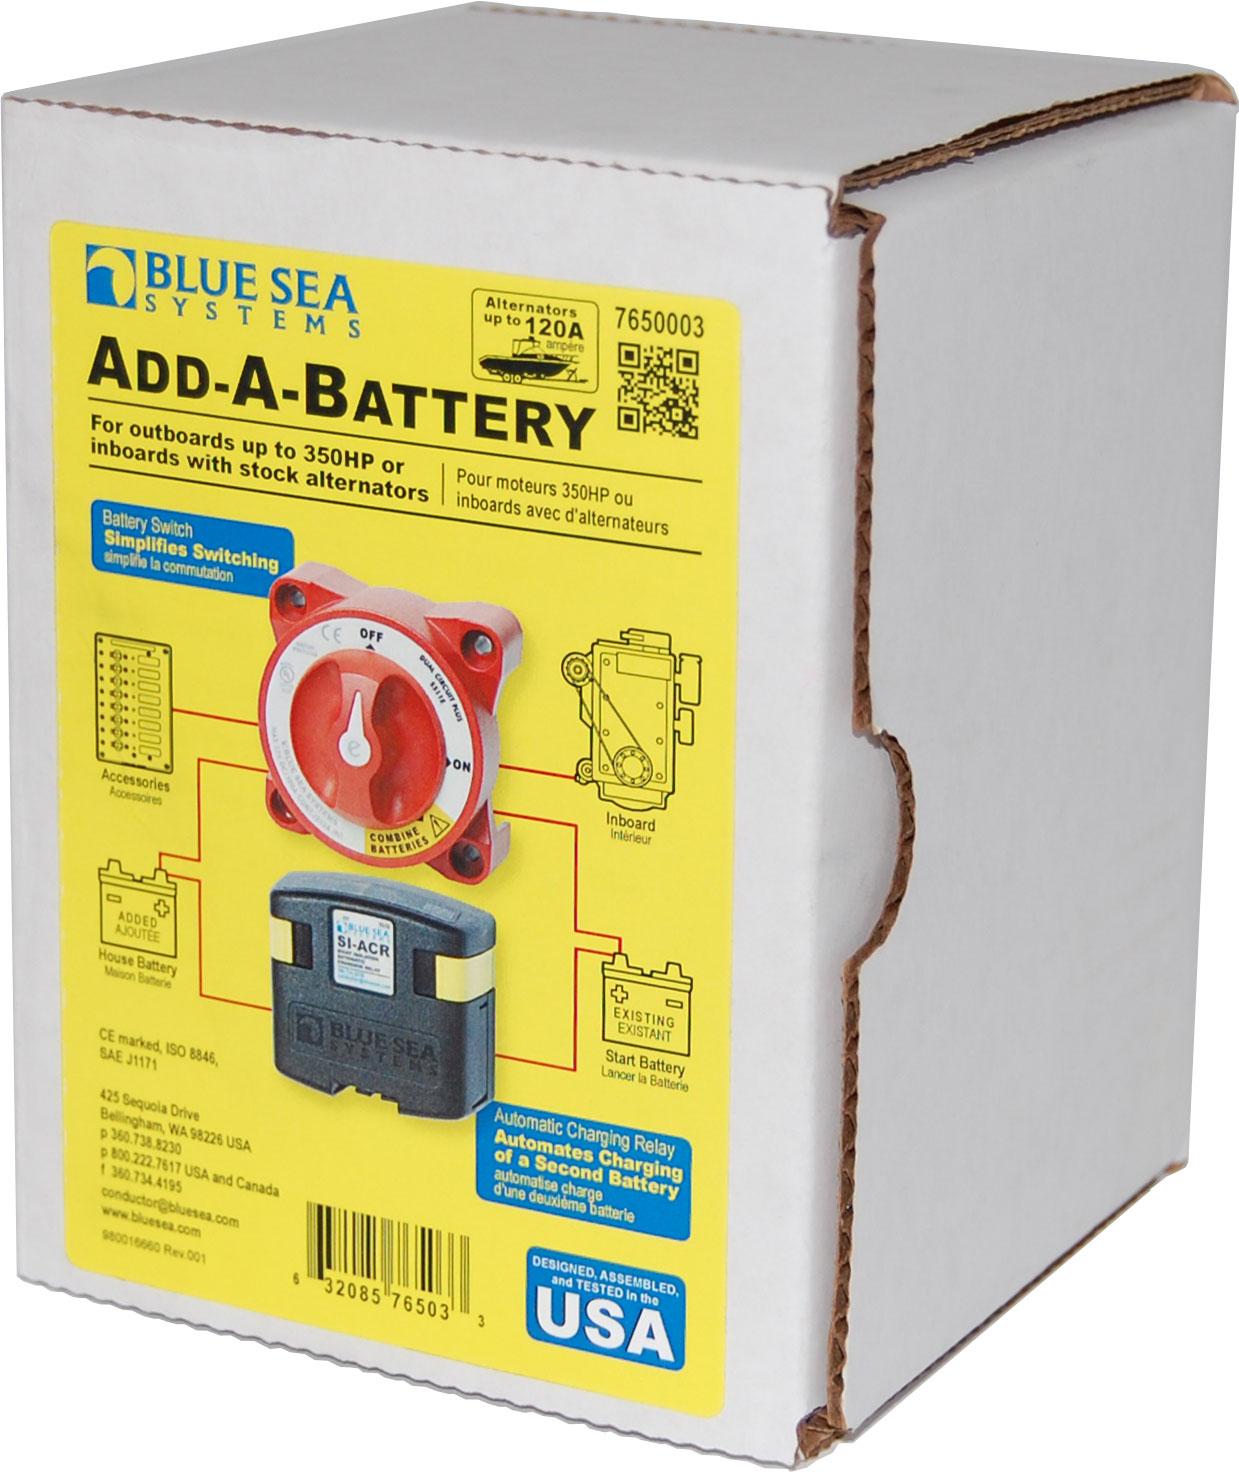 blue sea wiring diagram kubota starter solenoid automatic charging relay marine